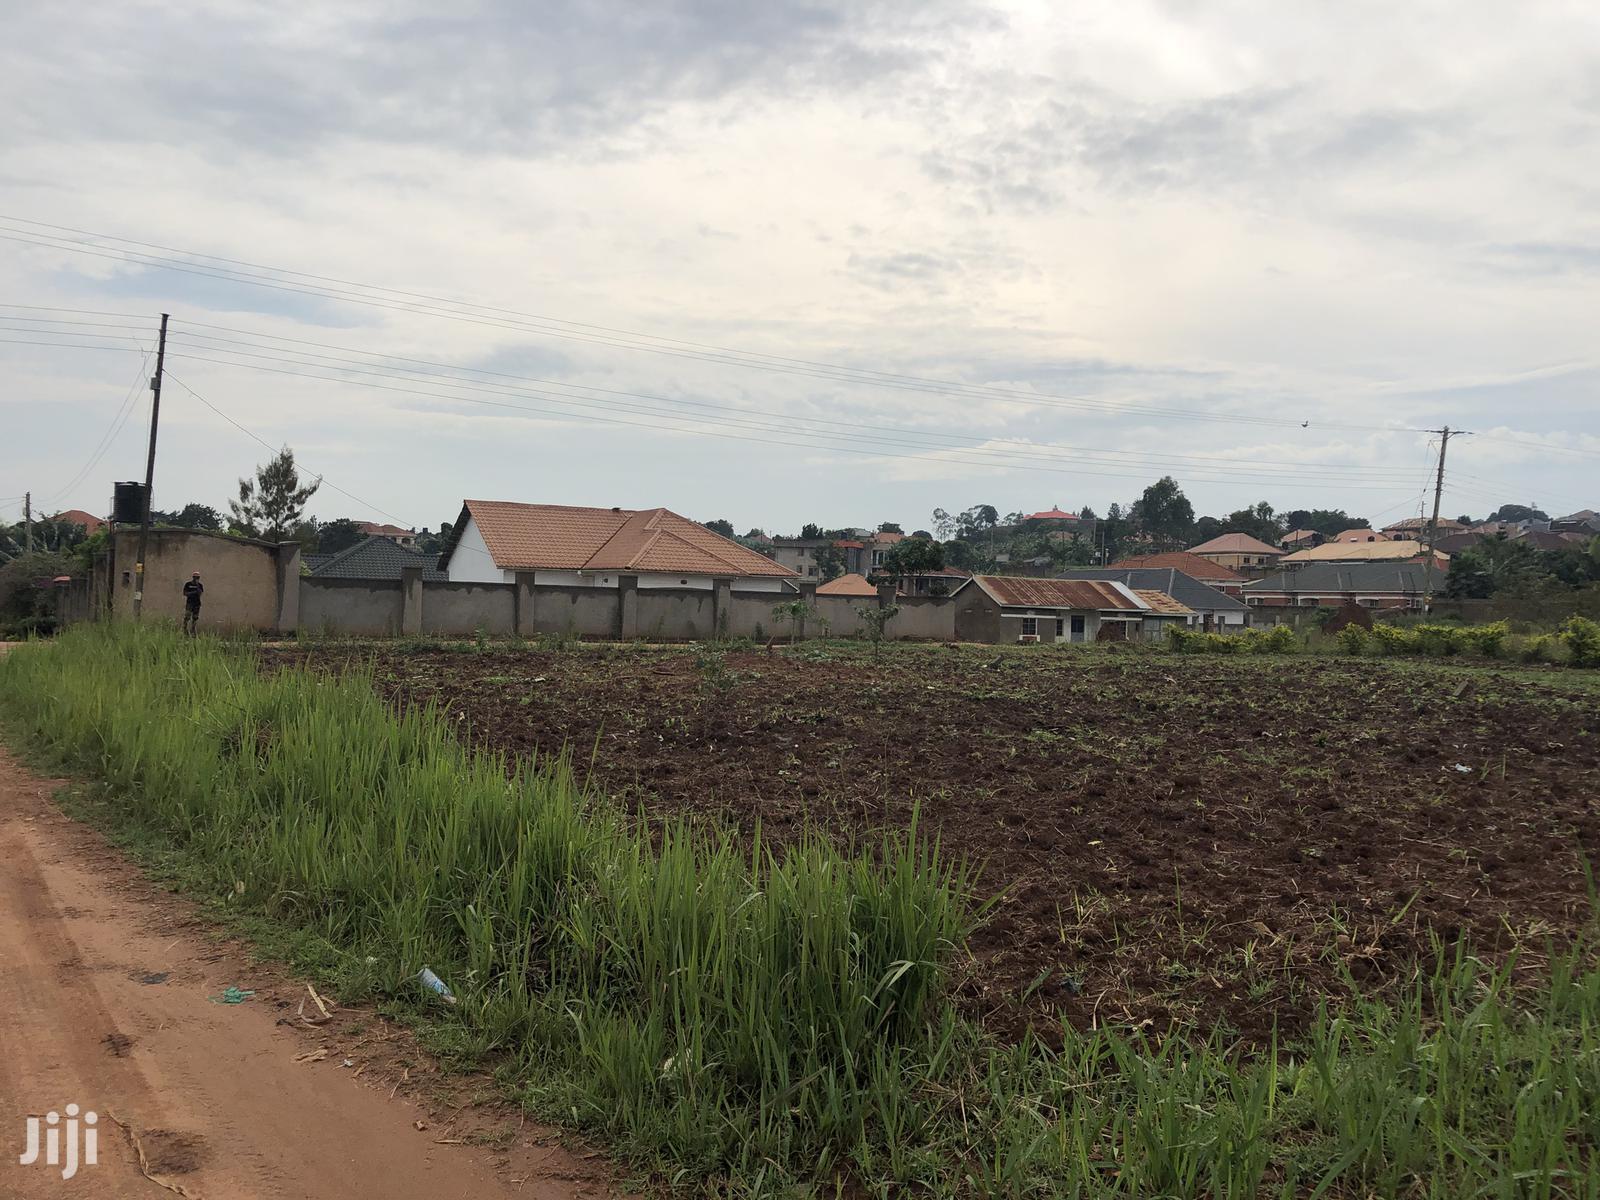 Hot,Kira Nakwero Posh Land on Sell | Land & Plots For Sale for sale in Kampala, Central Region, Uganda